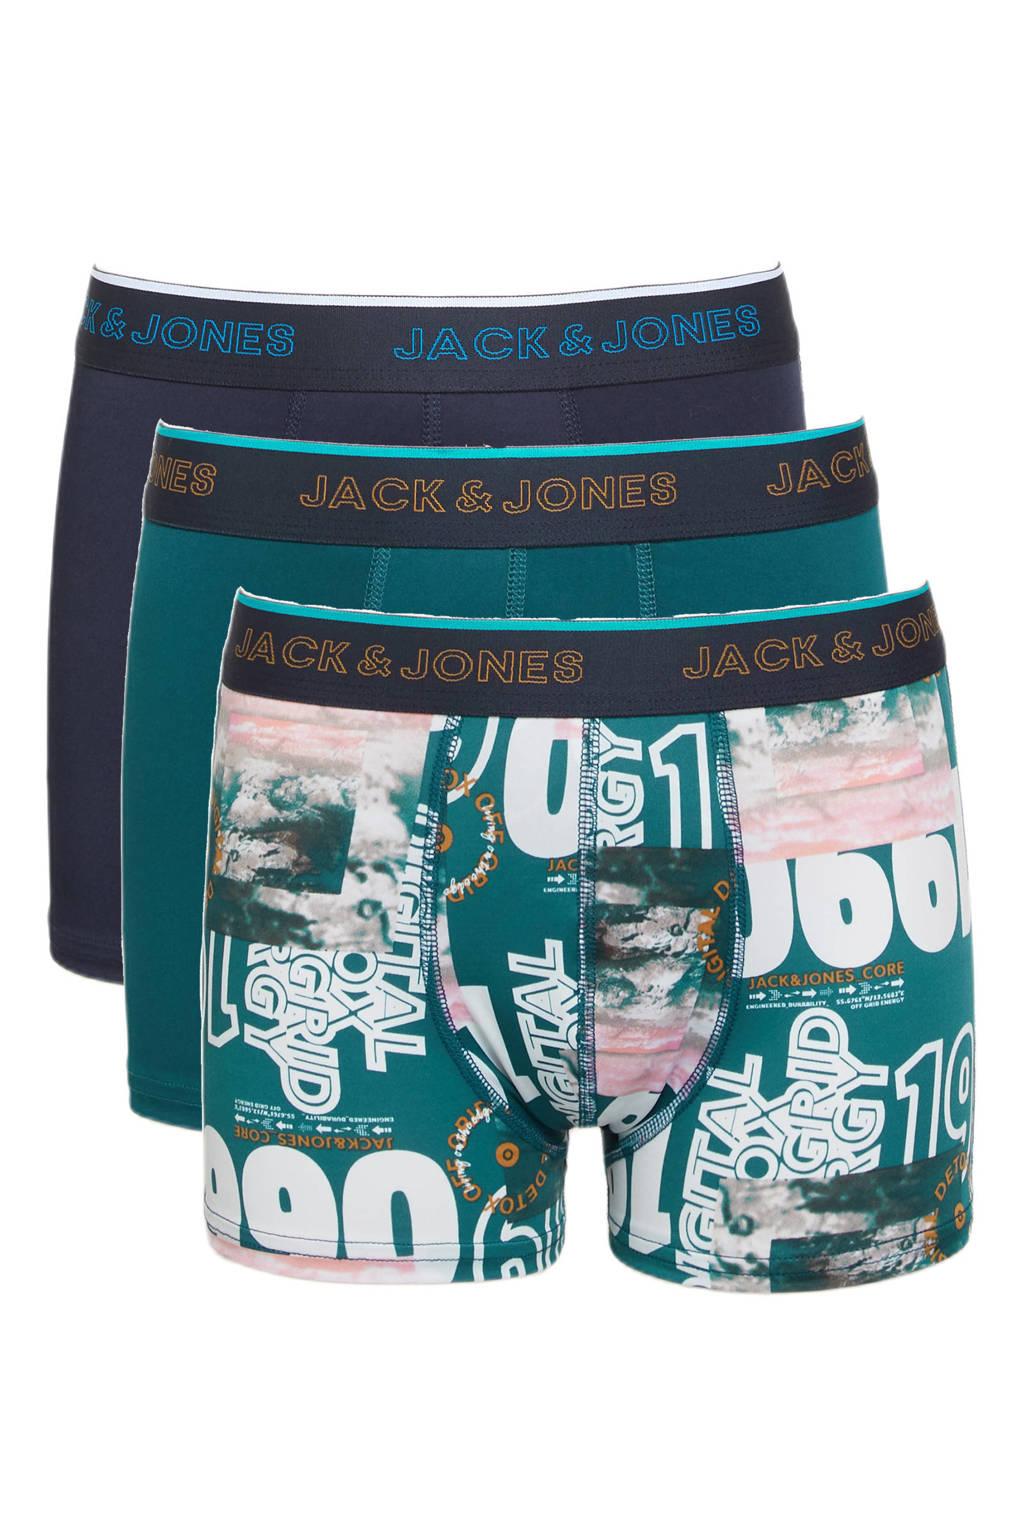 JACK & JONES JUNIOR   boxershort JACCLOUND - set van 3 multi color, Multi color